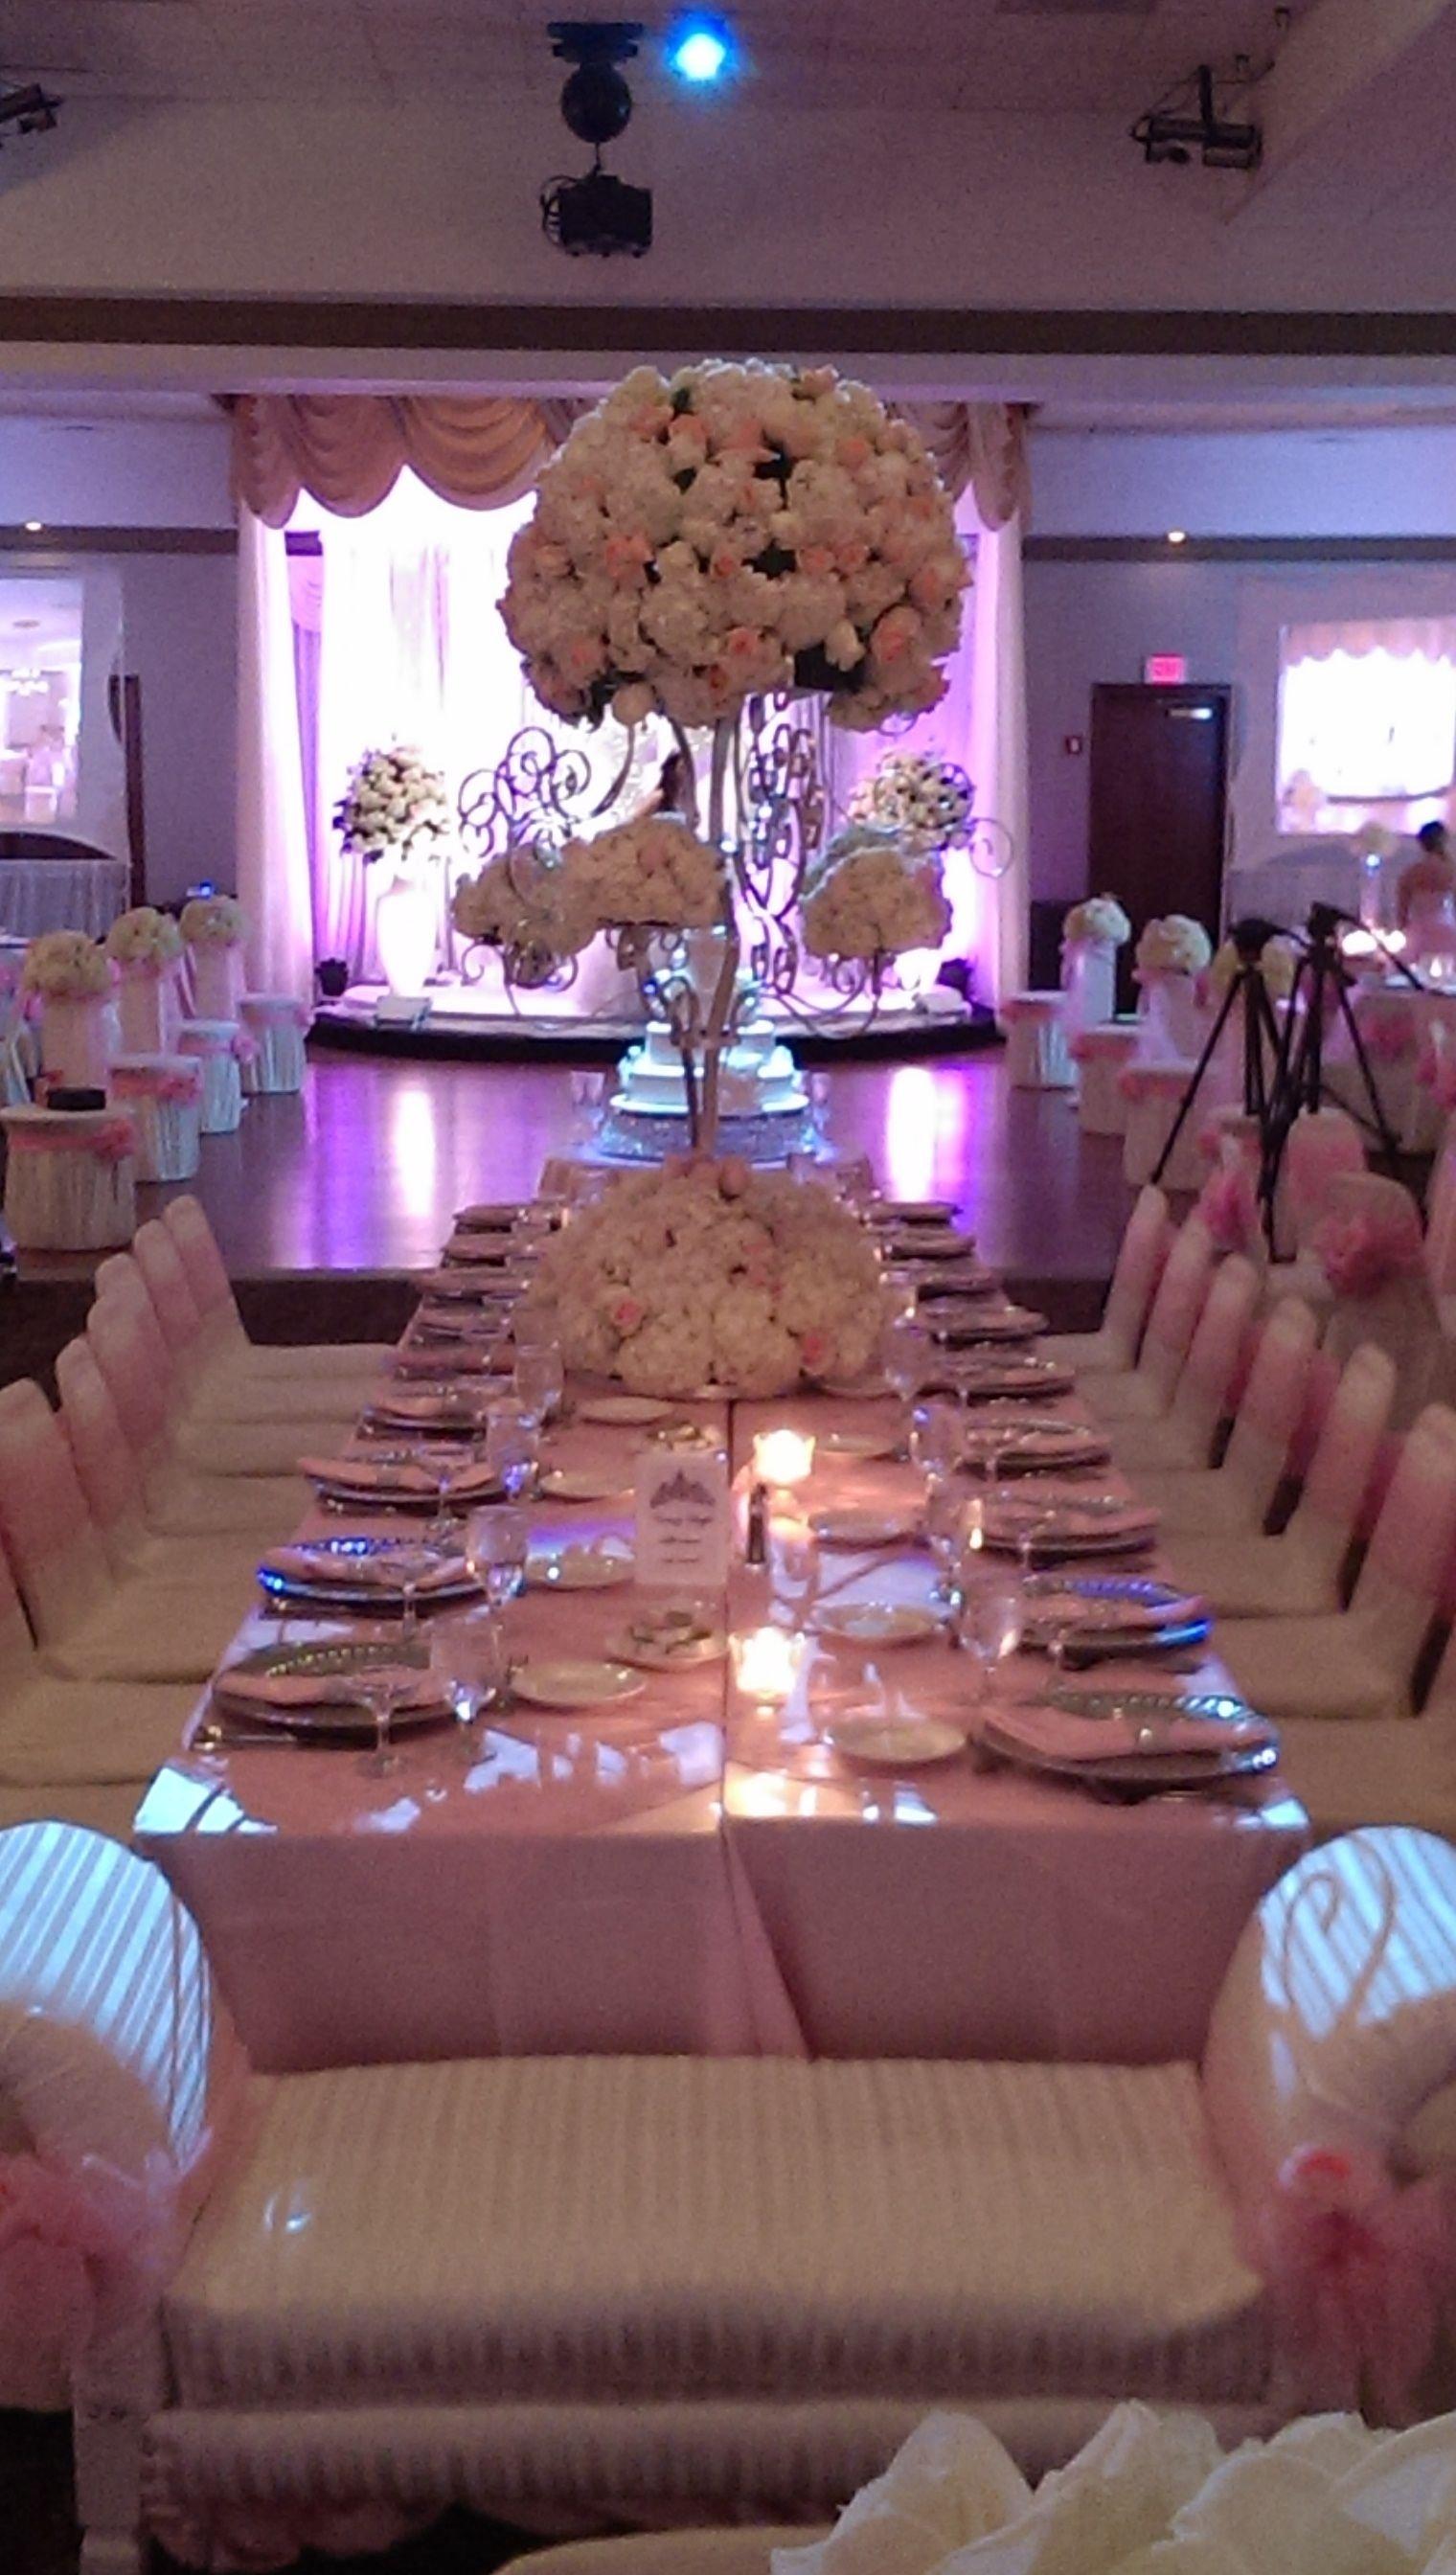 10 Amazing Sweet 16 Party Ideas Pinterest a stylish sweet 16 table setup bookingentertainment sweet16